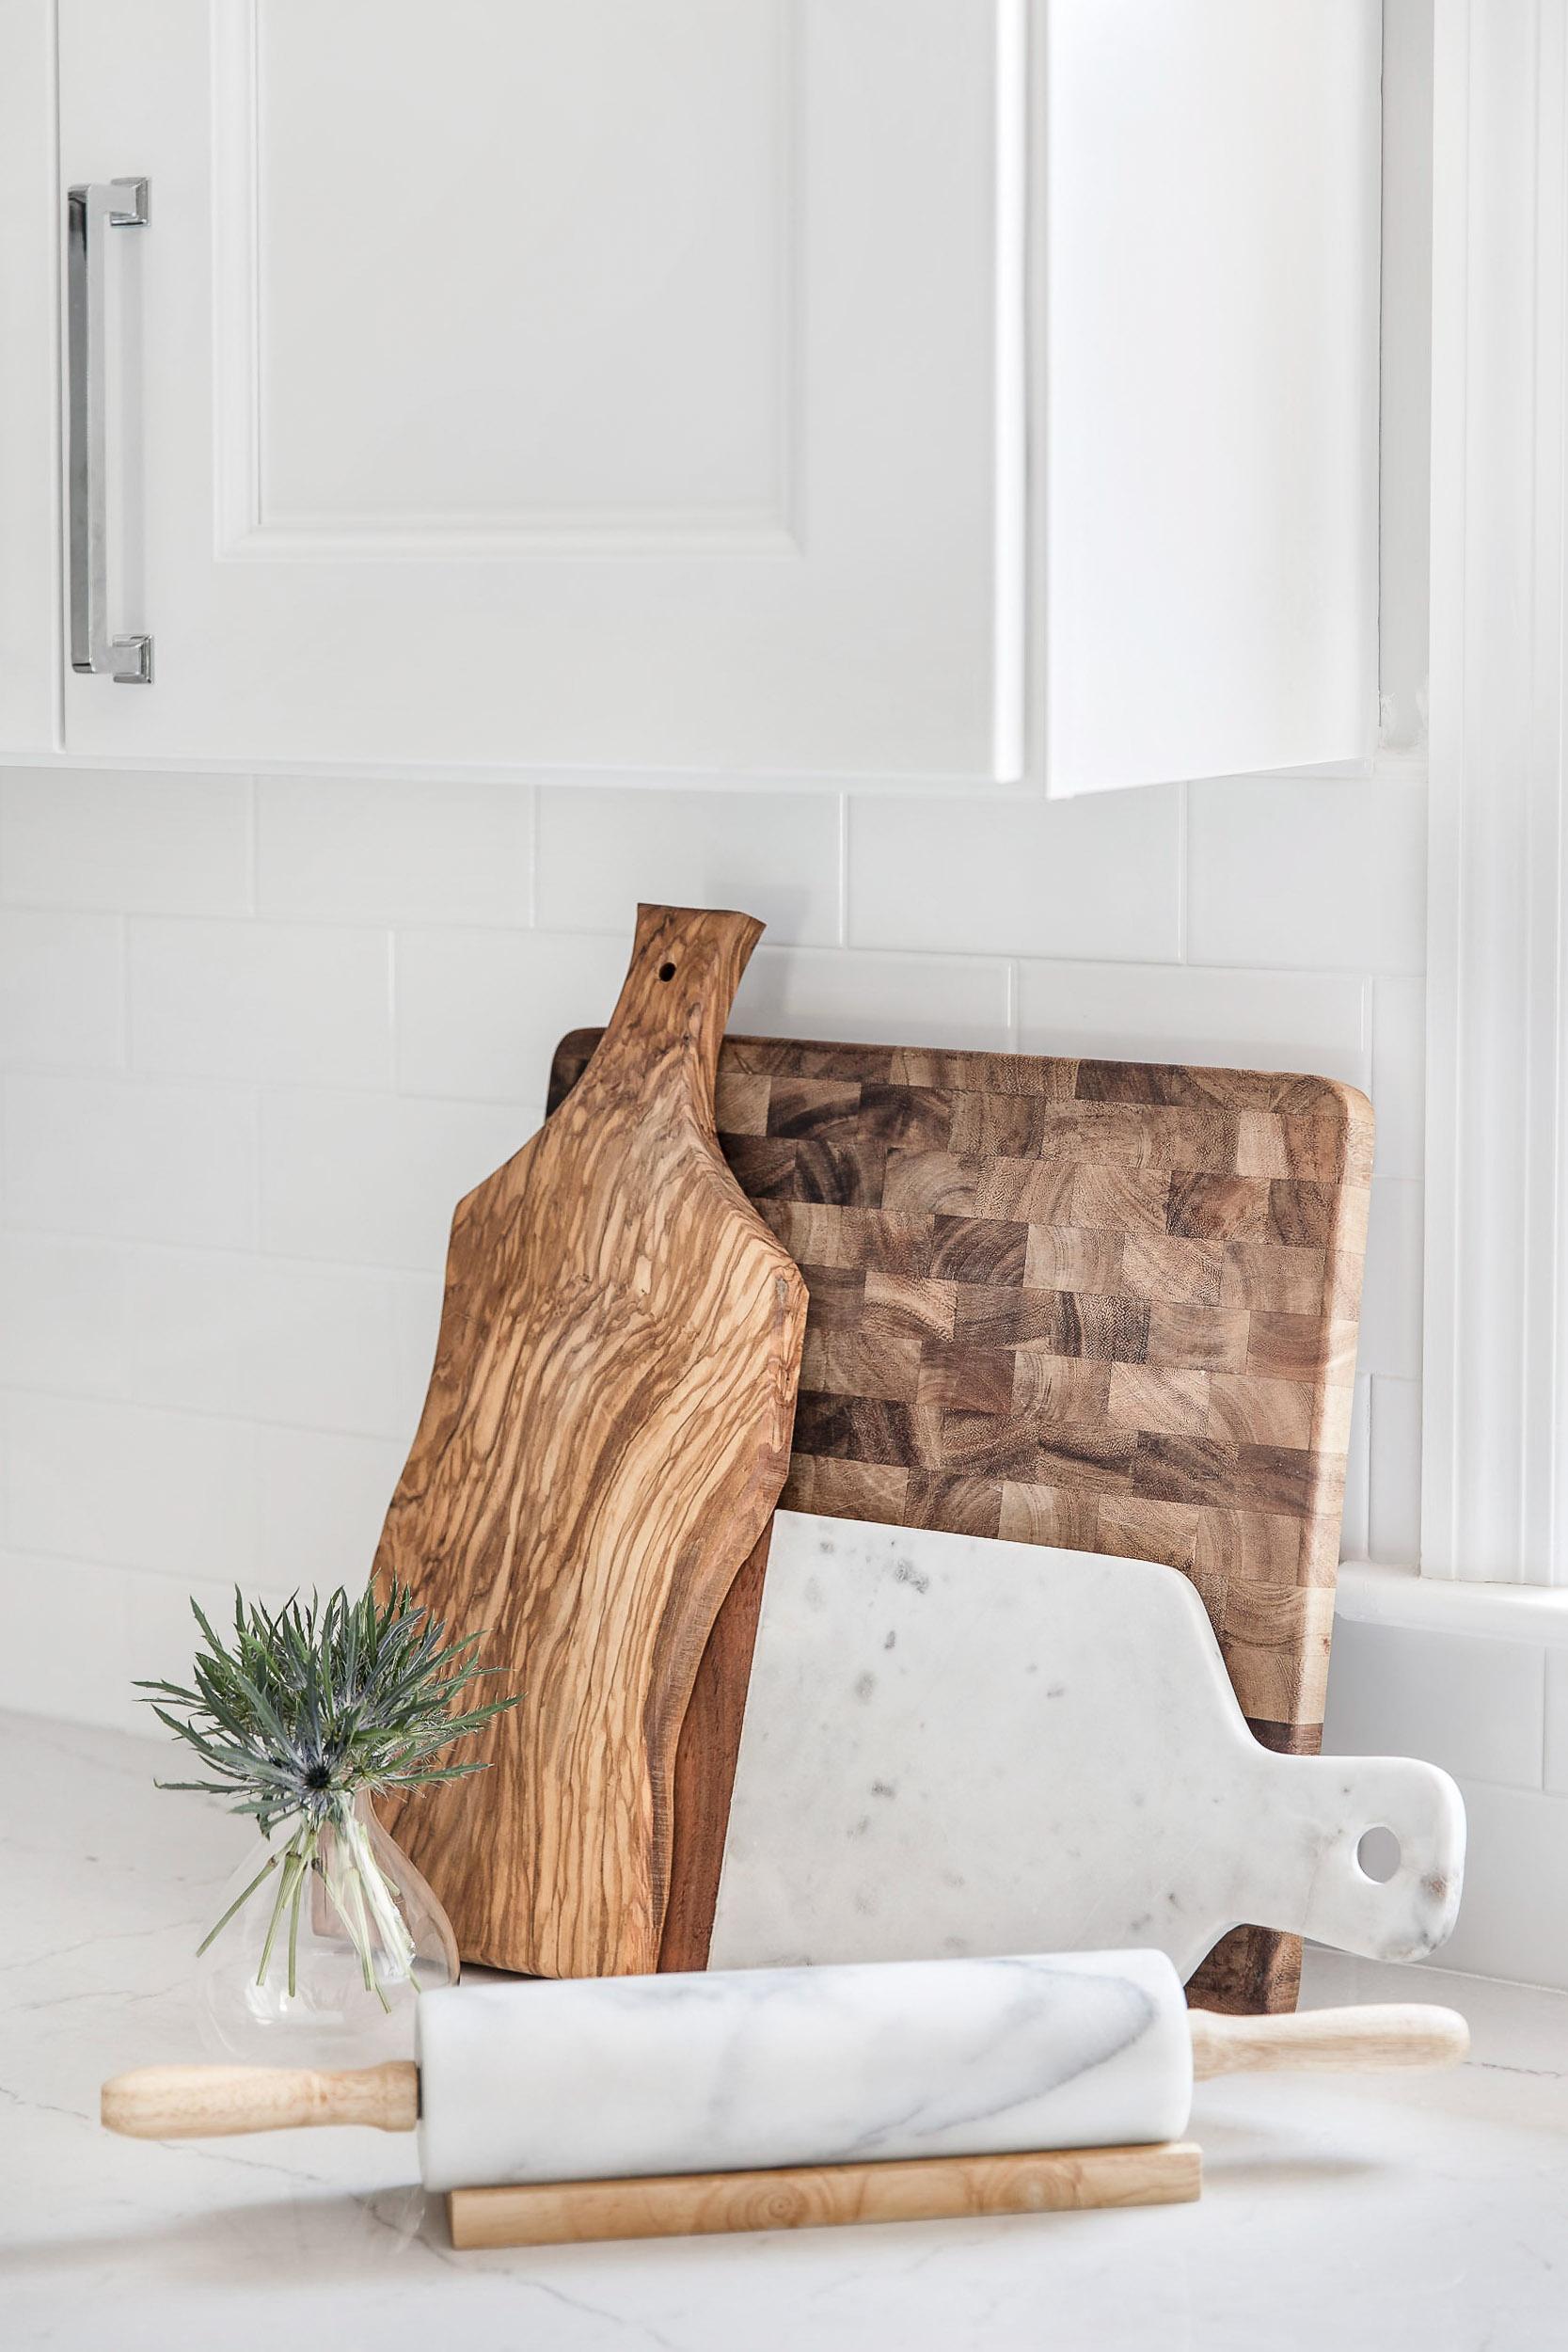 Interior Design Photography for Jessica Bandel, Interior Designe